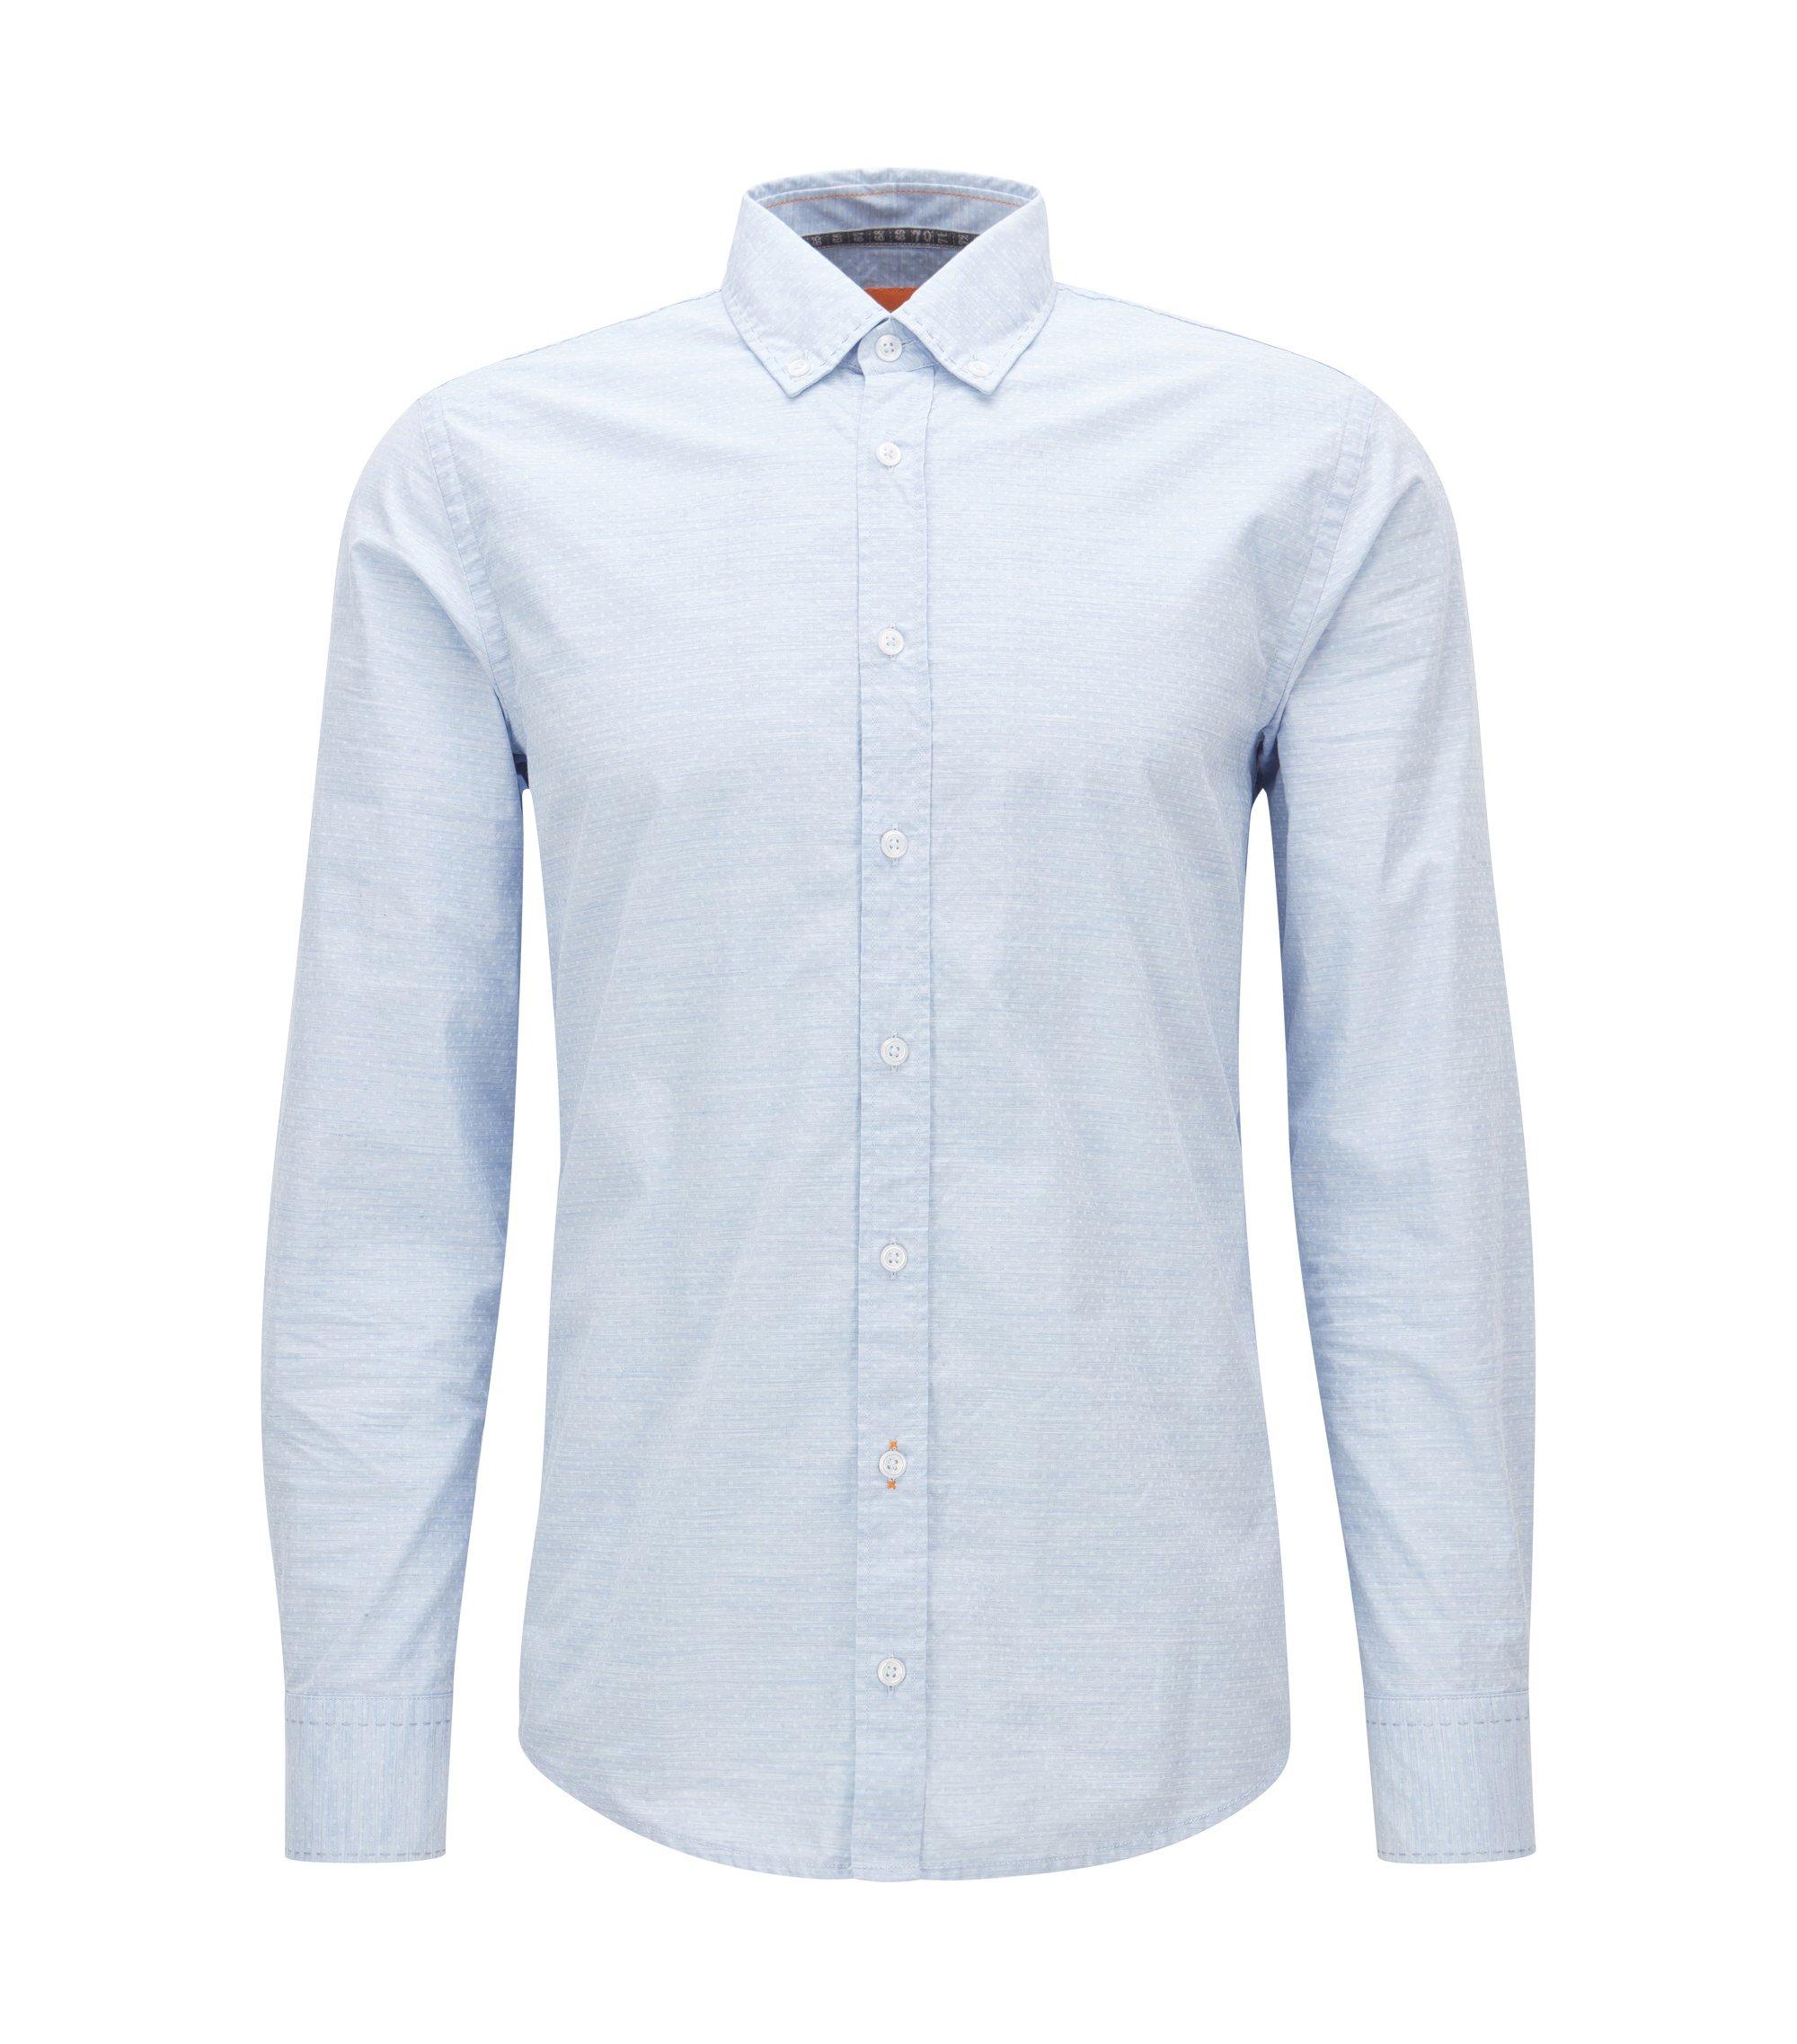 Polka Dot Cotton Button Down Shirt, Slim Fit | Epreppy, Open Blue